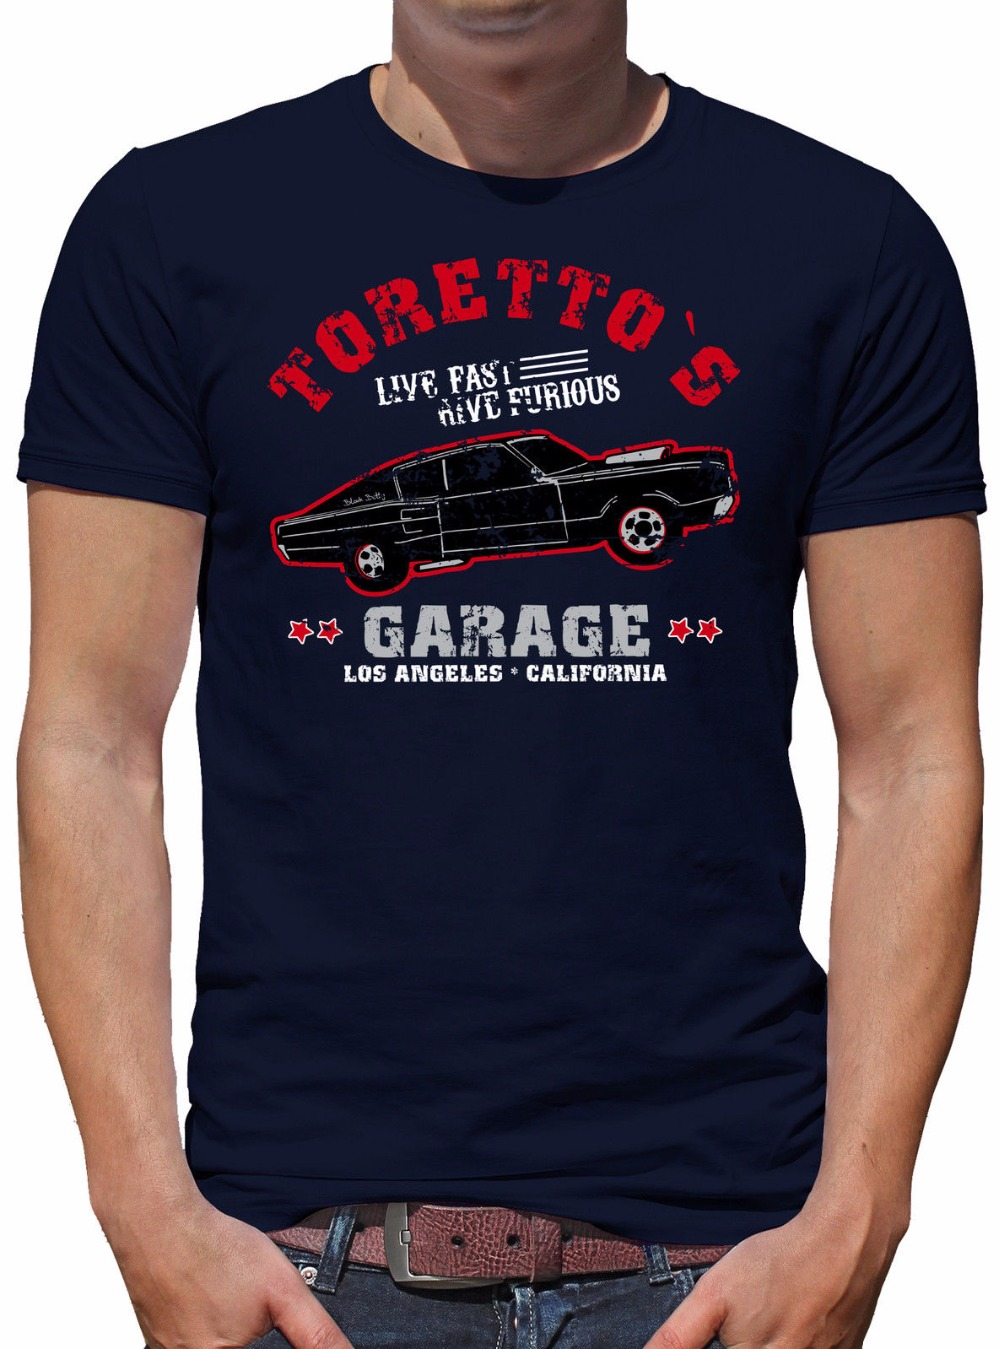 Men 2019 New Short Sleeve T-Shirt Short Sleeve TLM Toretto Garage Herren design your own T shirt Cotton Men T-Shirts Classical